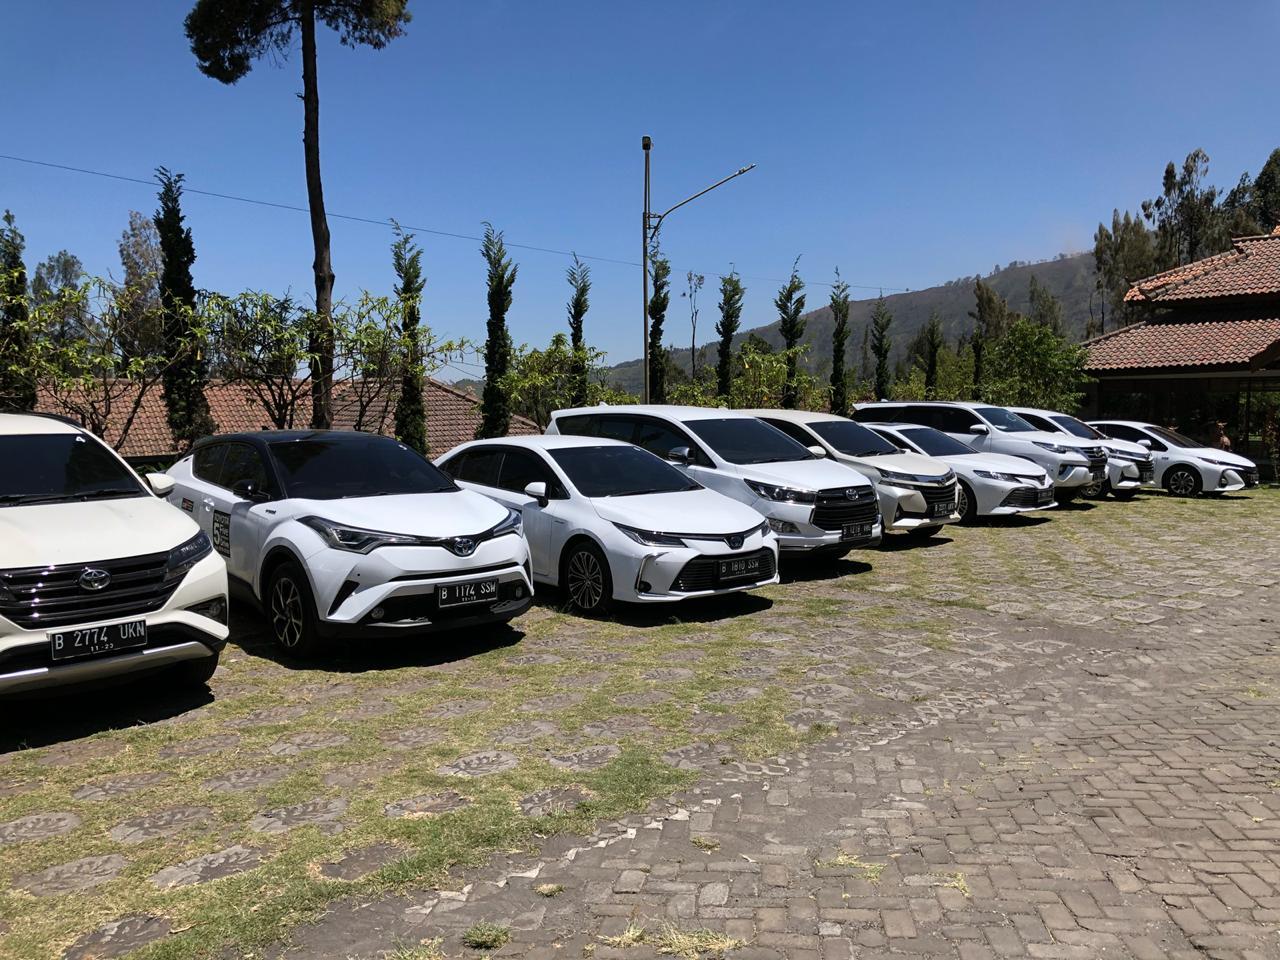 Toyota Riset Kondisi Jalan dan Kebutuhan Indonesia, Buat Apa?